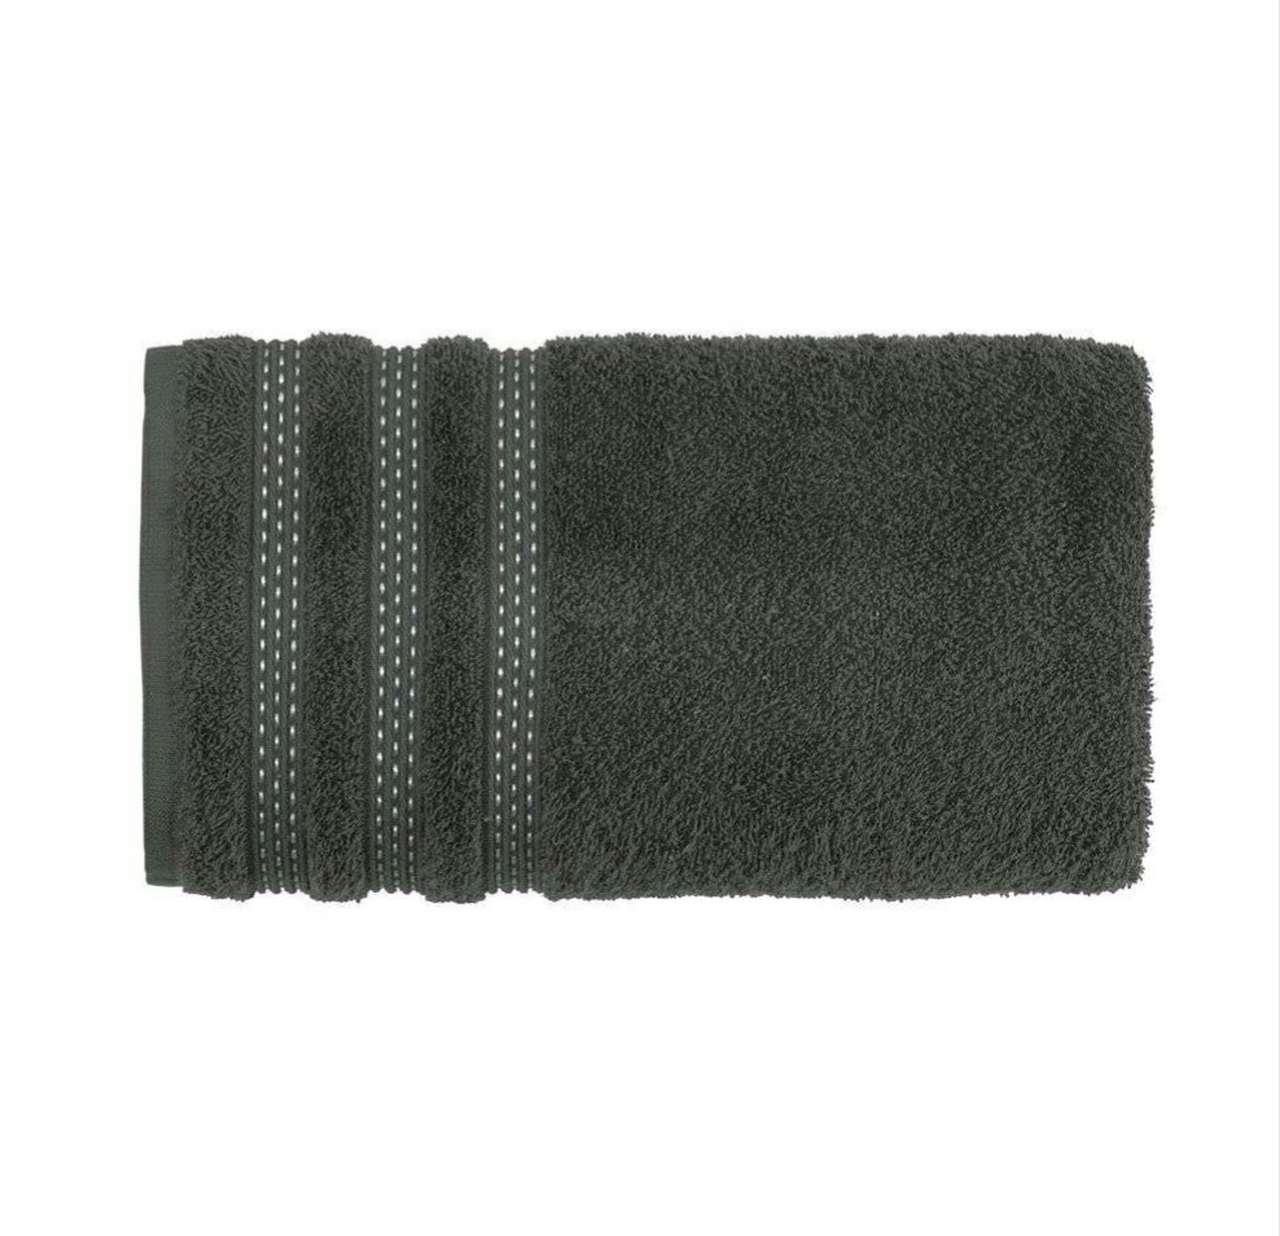 Toalha banho marcel 67x135 Carbono